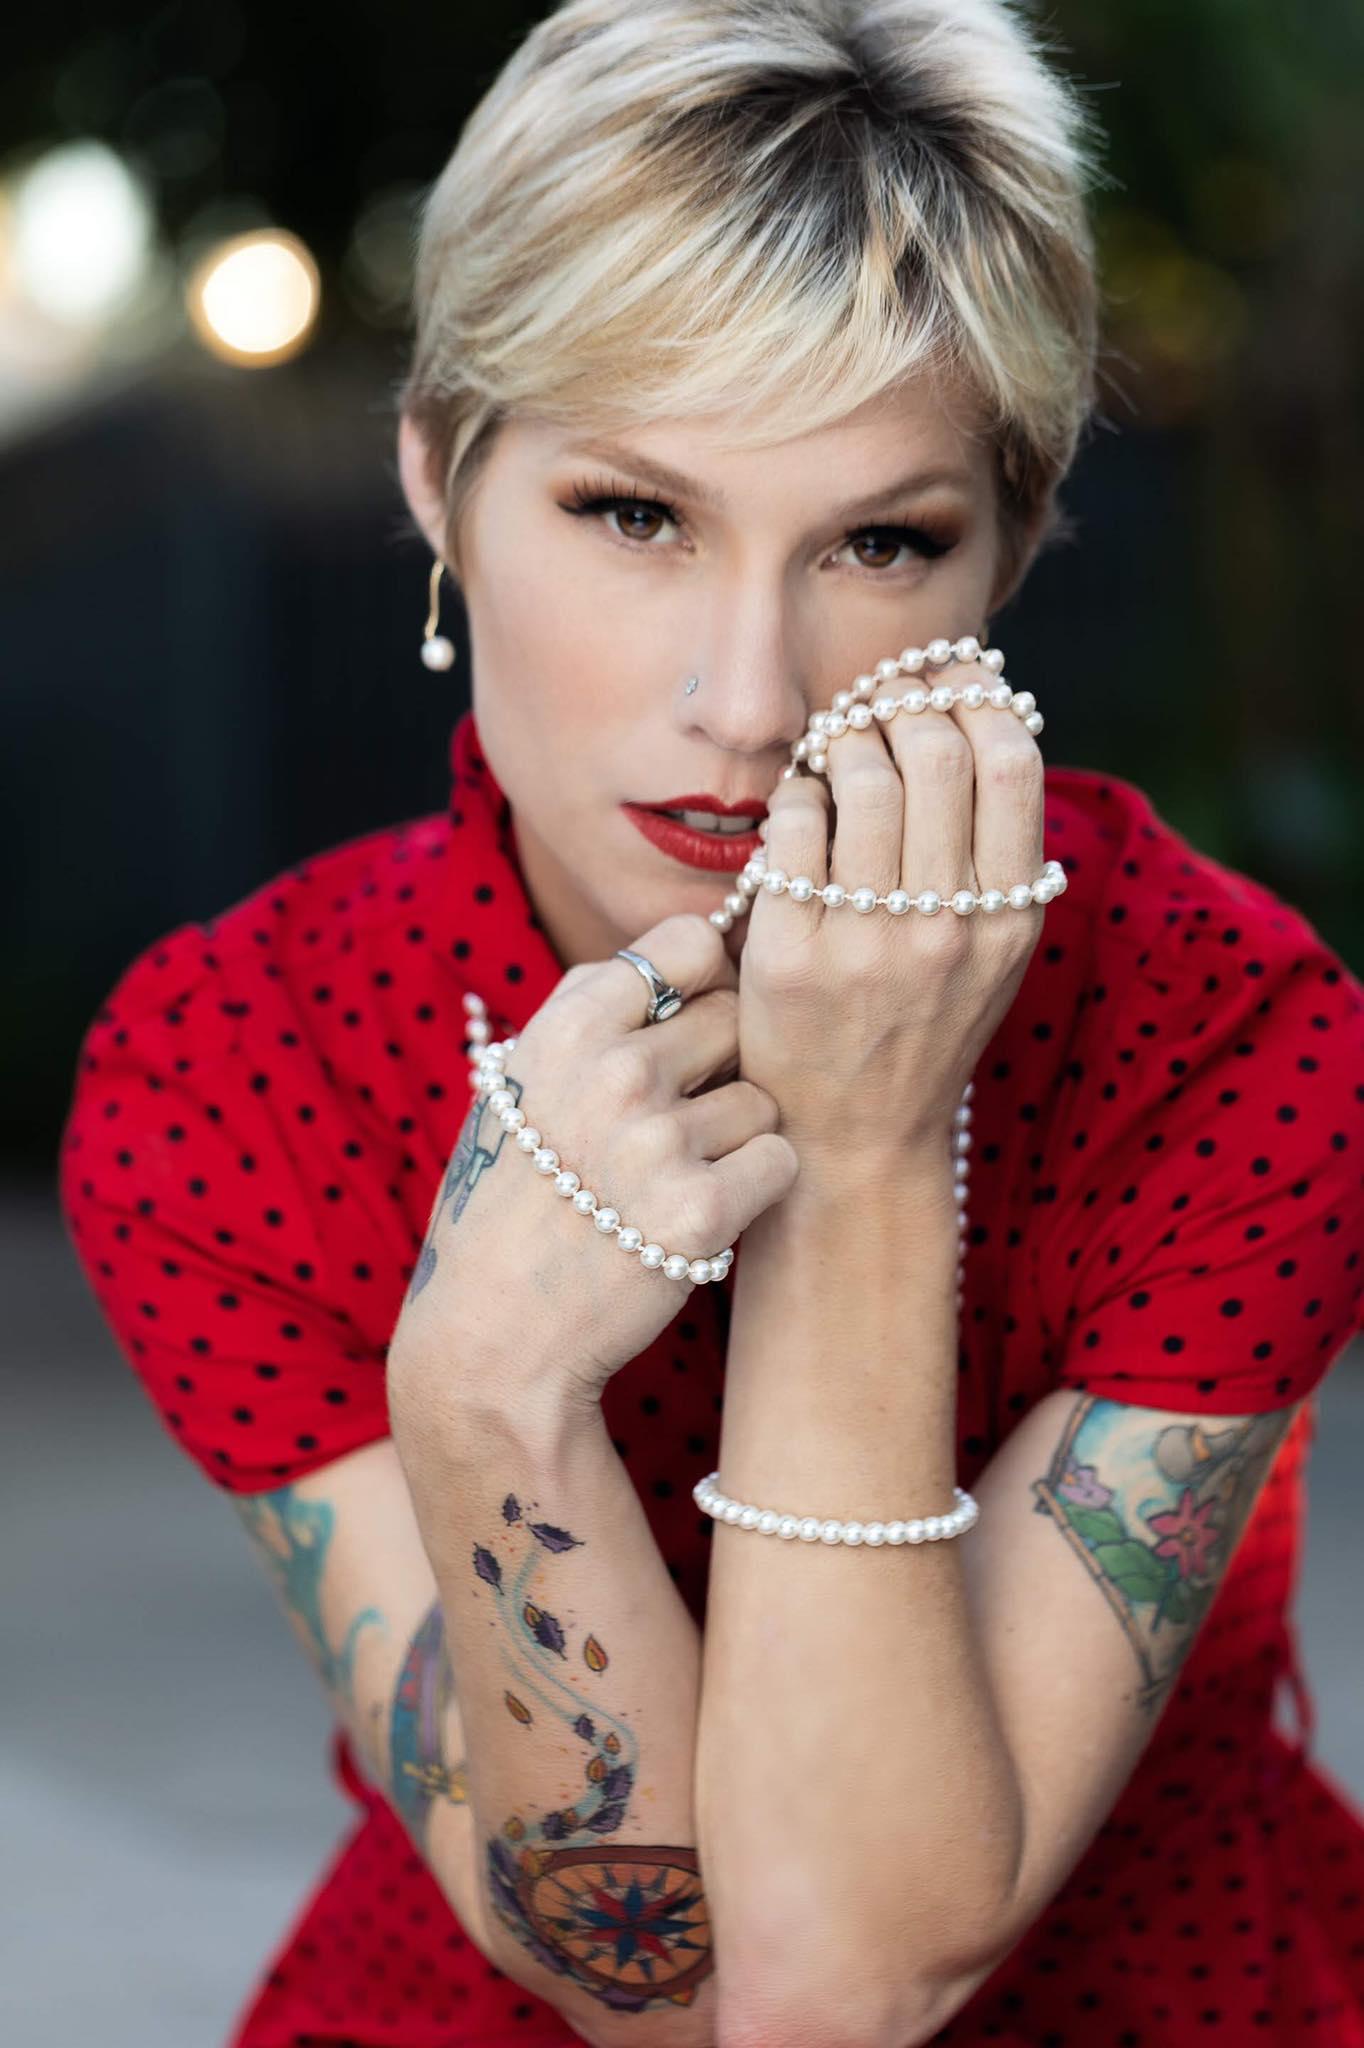 Jennifer Segura: Makeup Artist Specialized in Beauty Makeup and Body Art